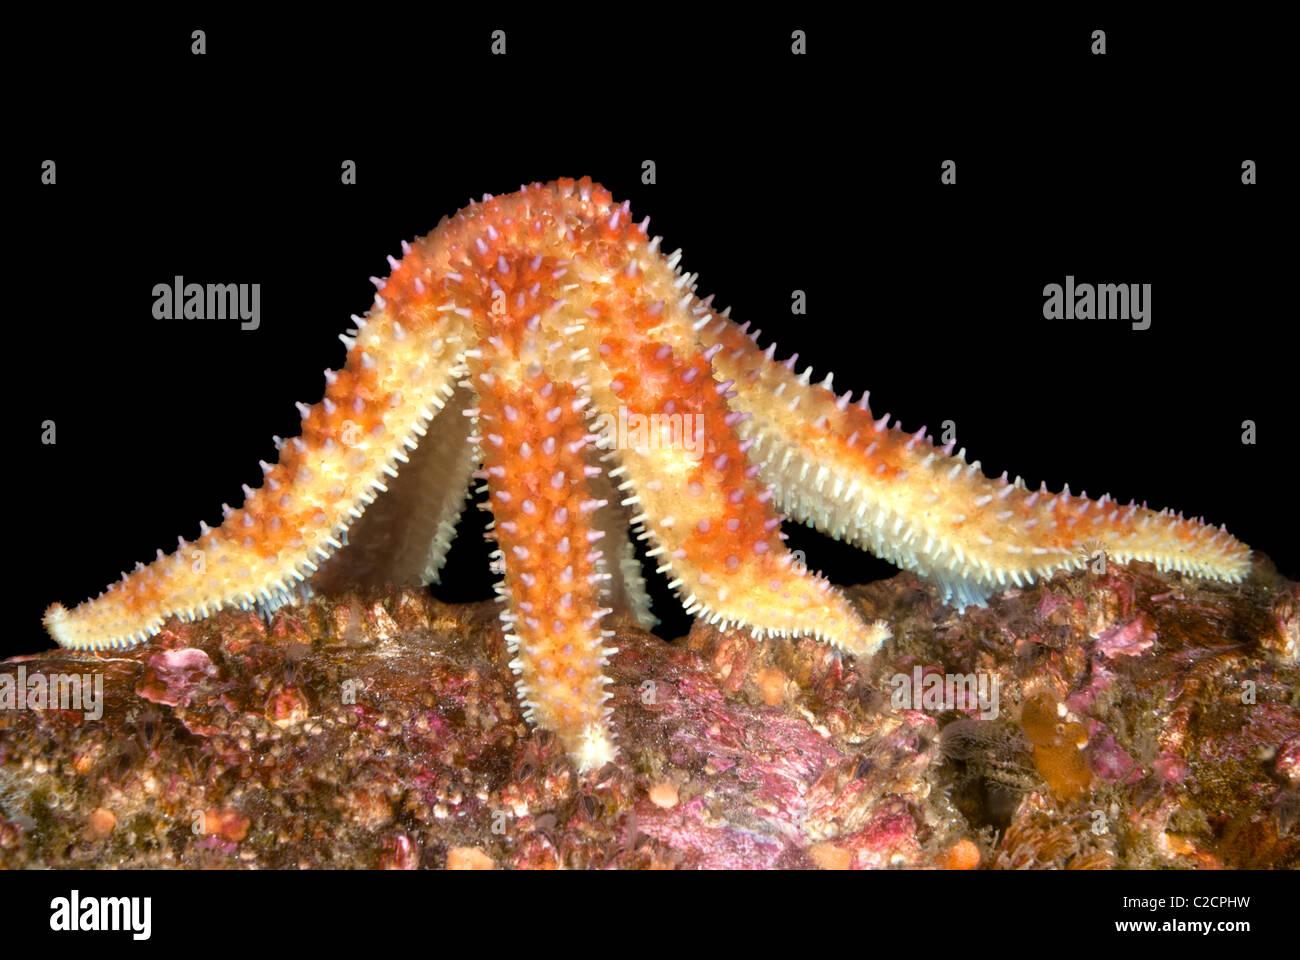 An unusual image of a feeding starfish off the coast of California. - Stock Image